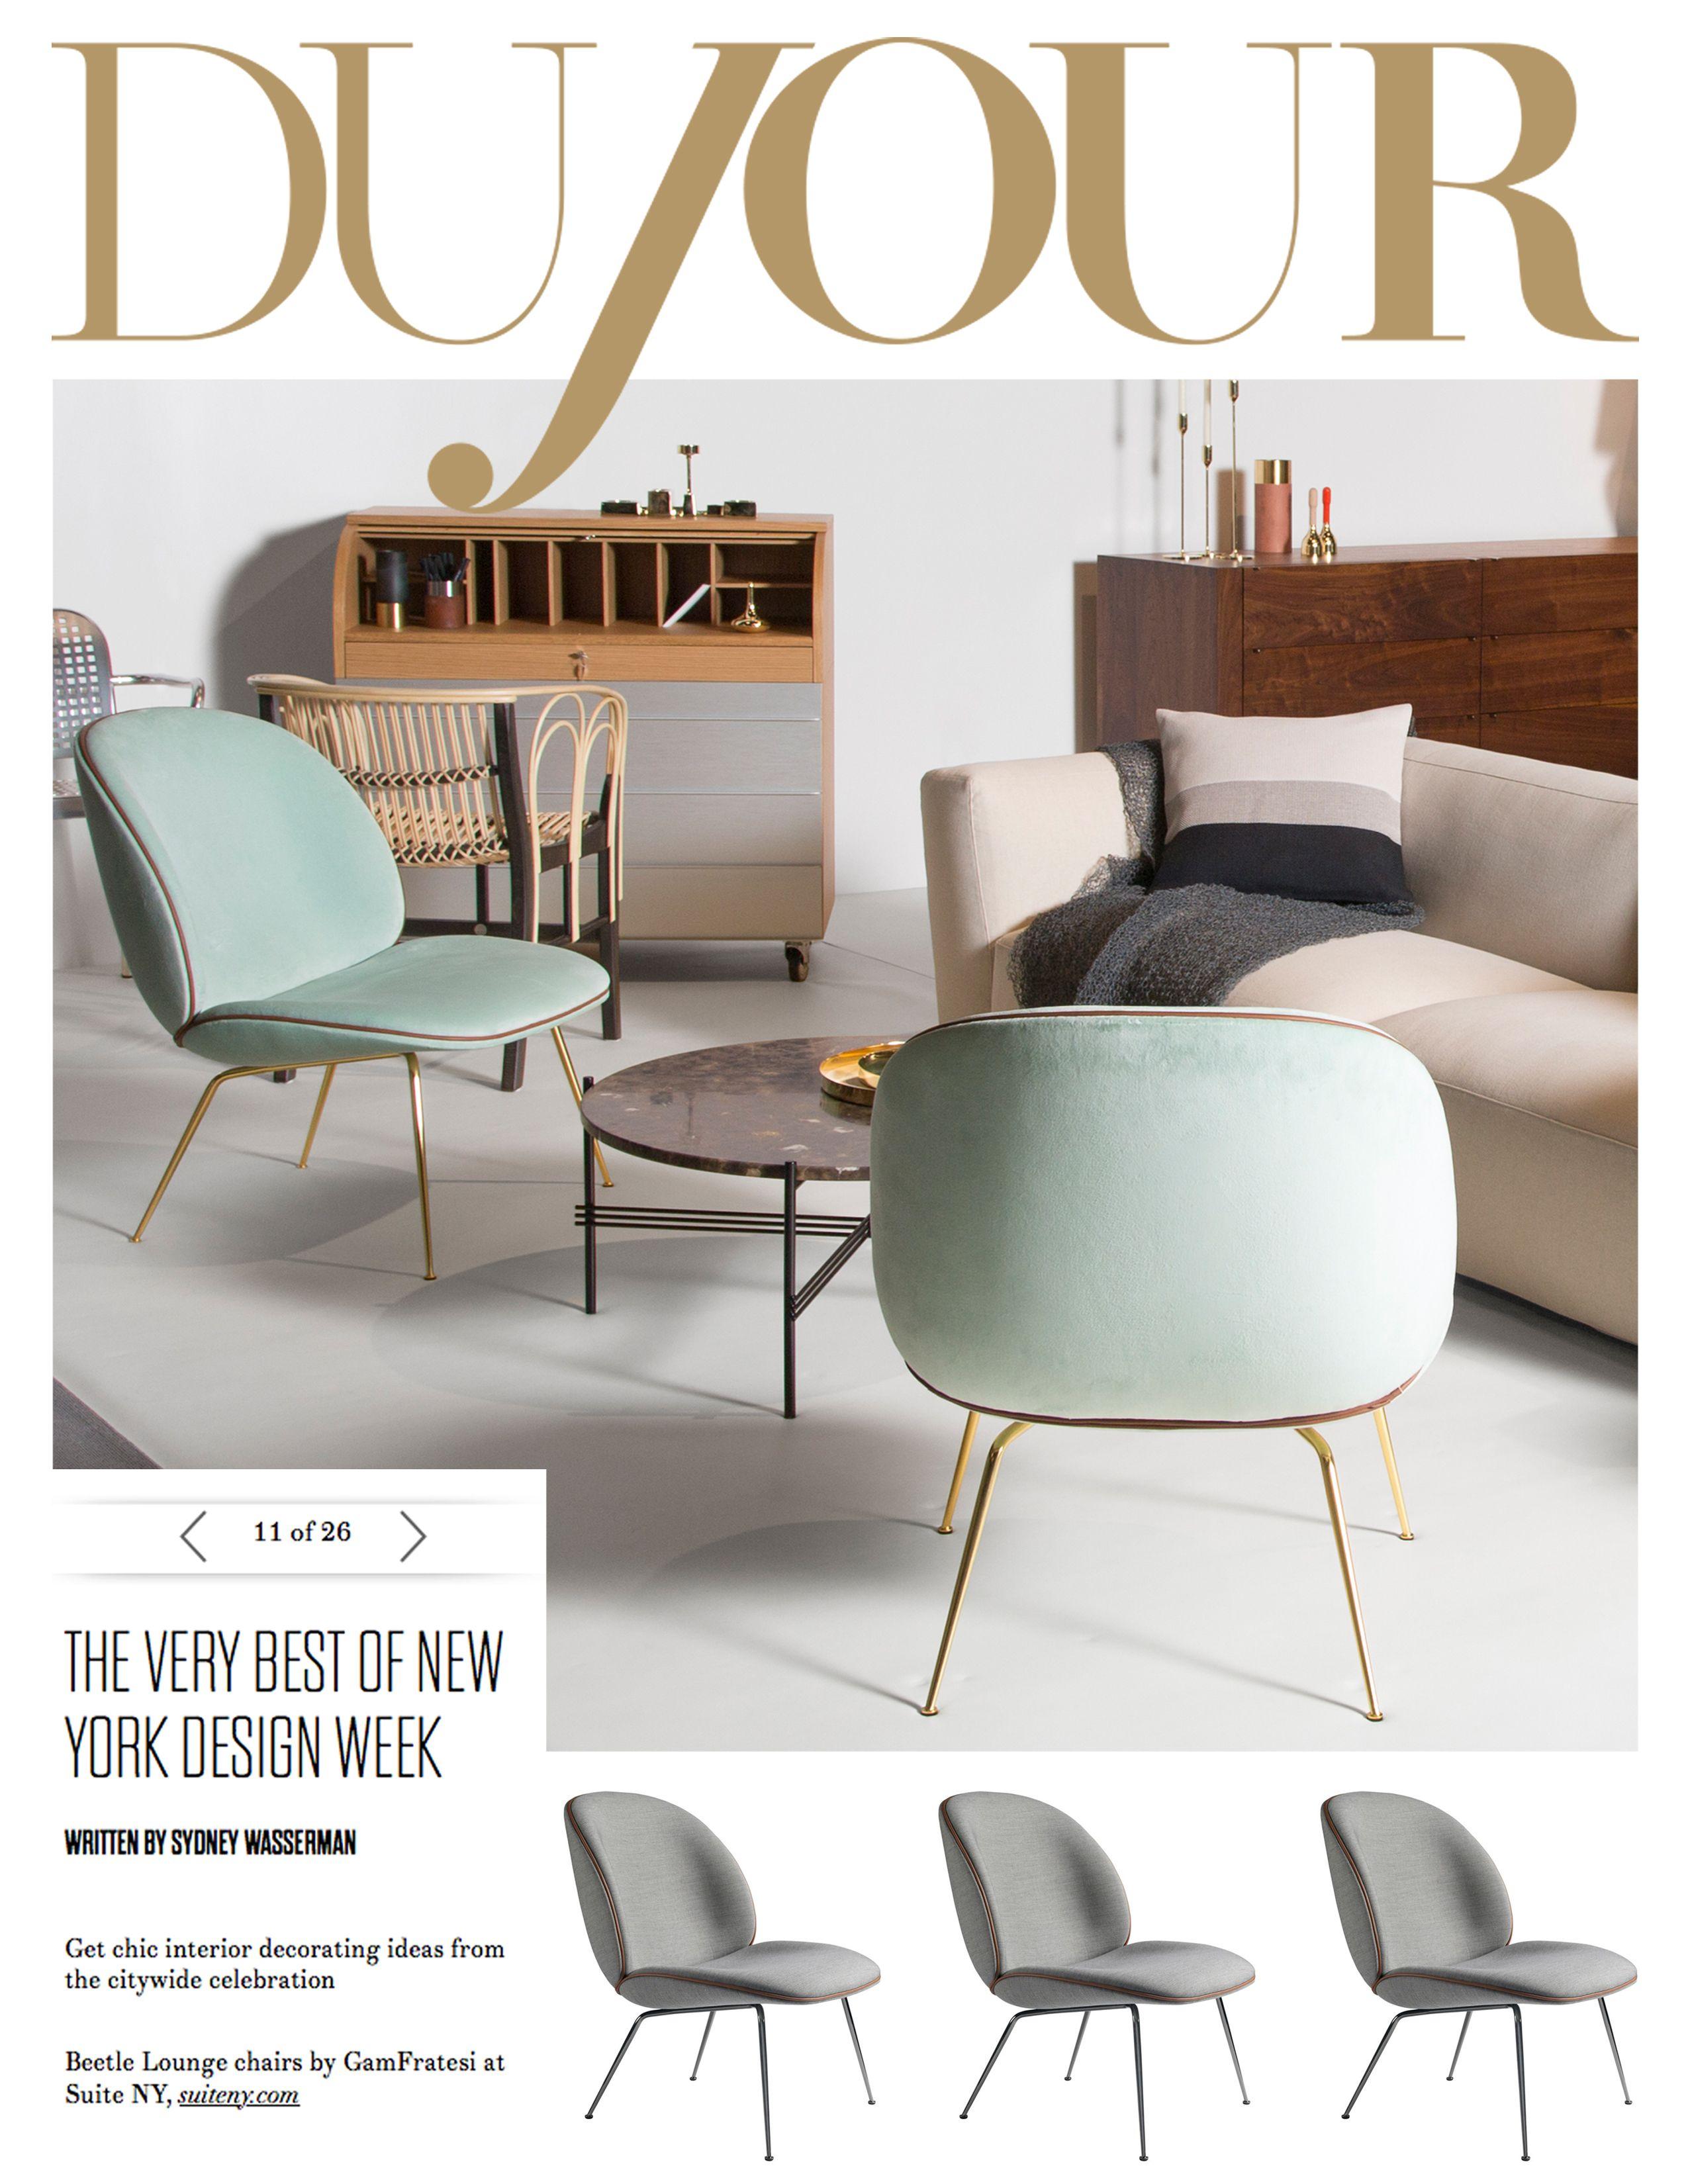 beetle lounge chair gamfratesi dujour magazine online icff 2015 best